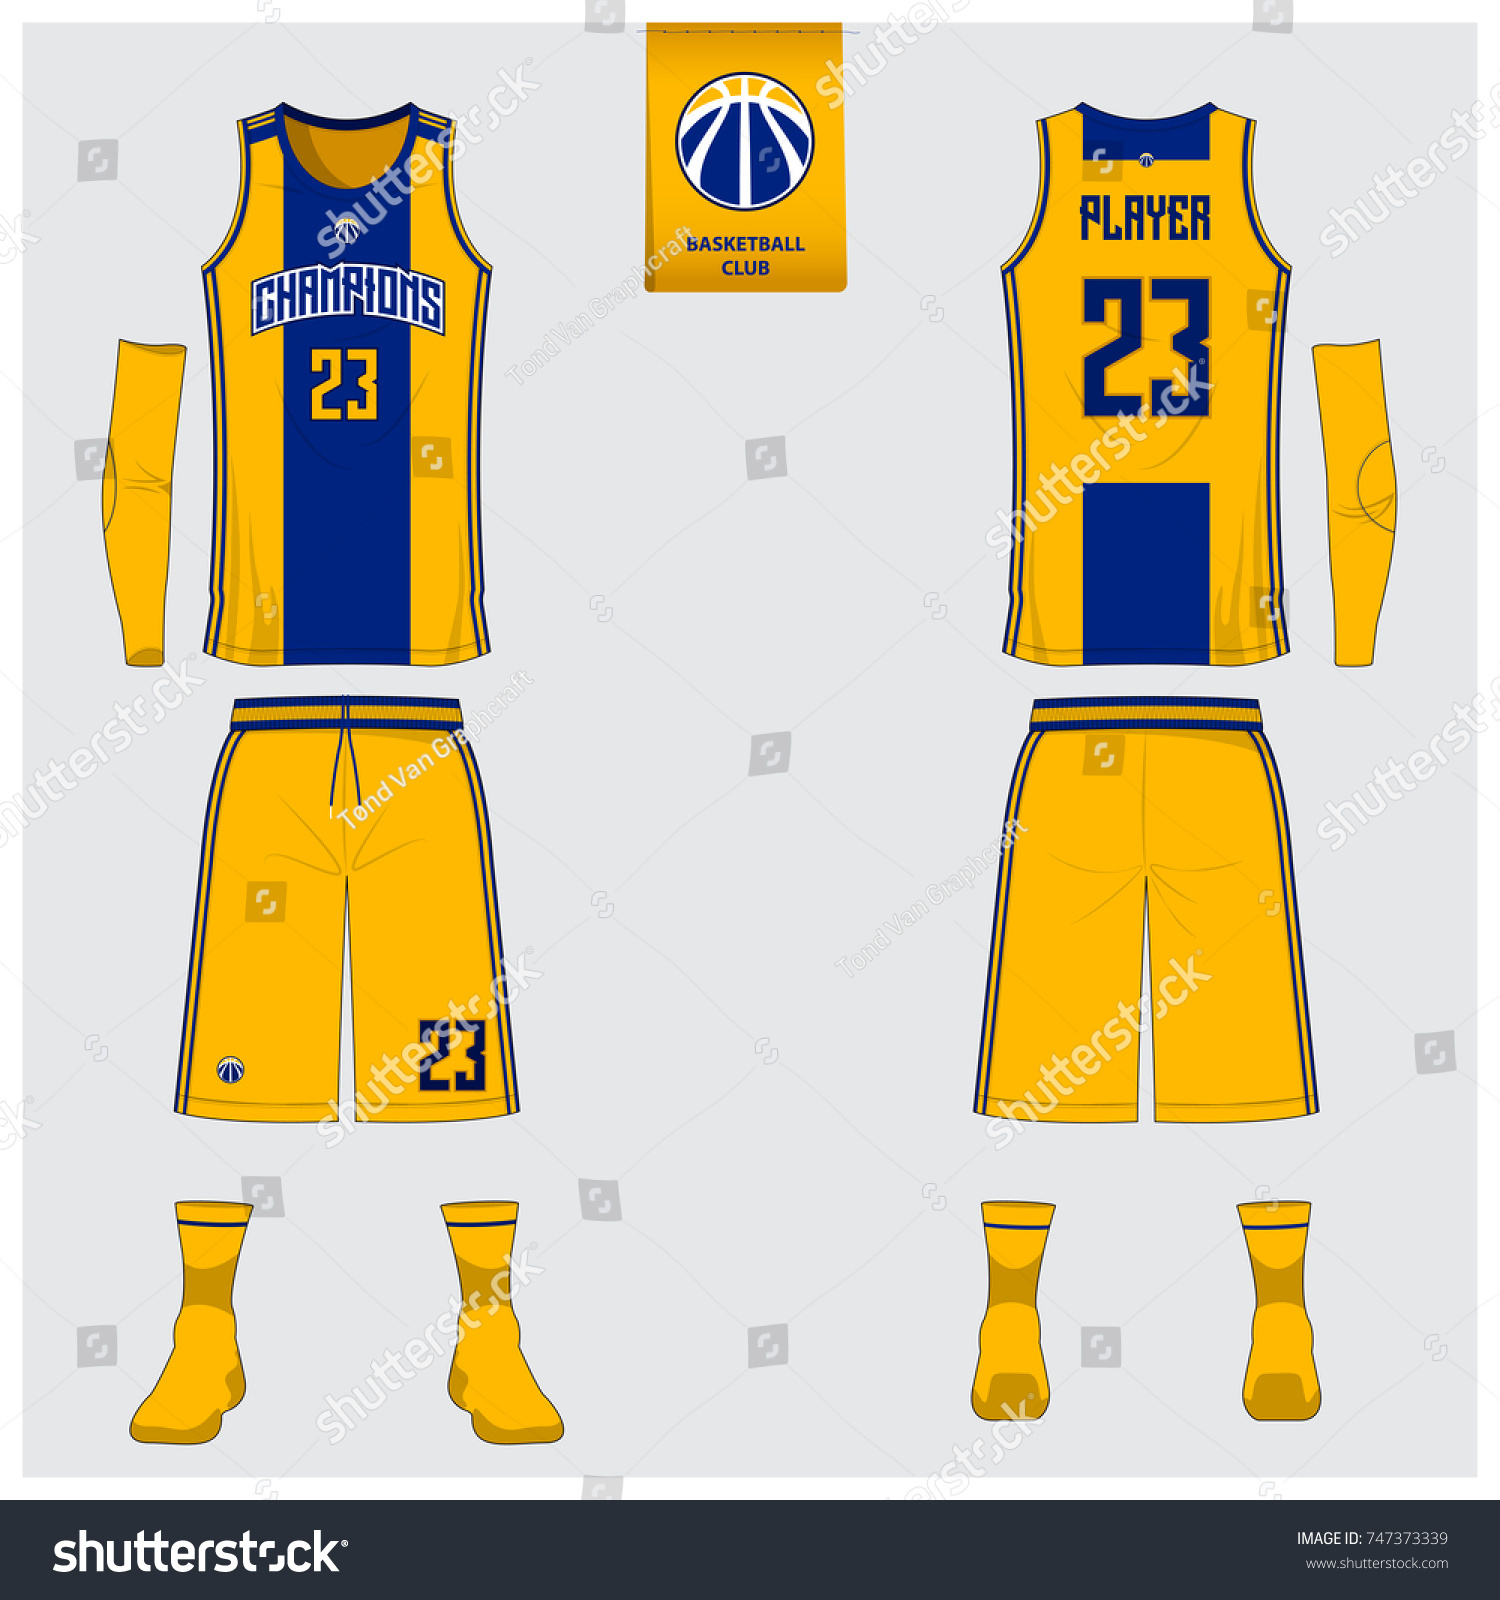 basketball uniform template design yellow blue のベクター画像素材